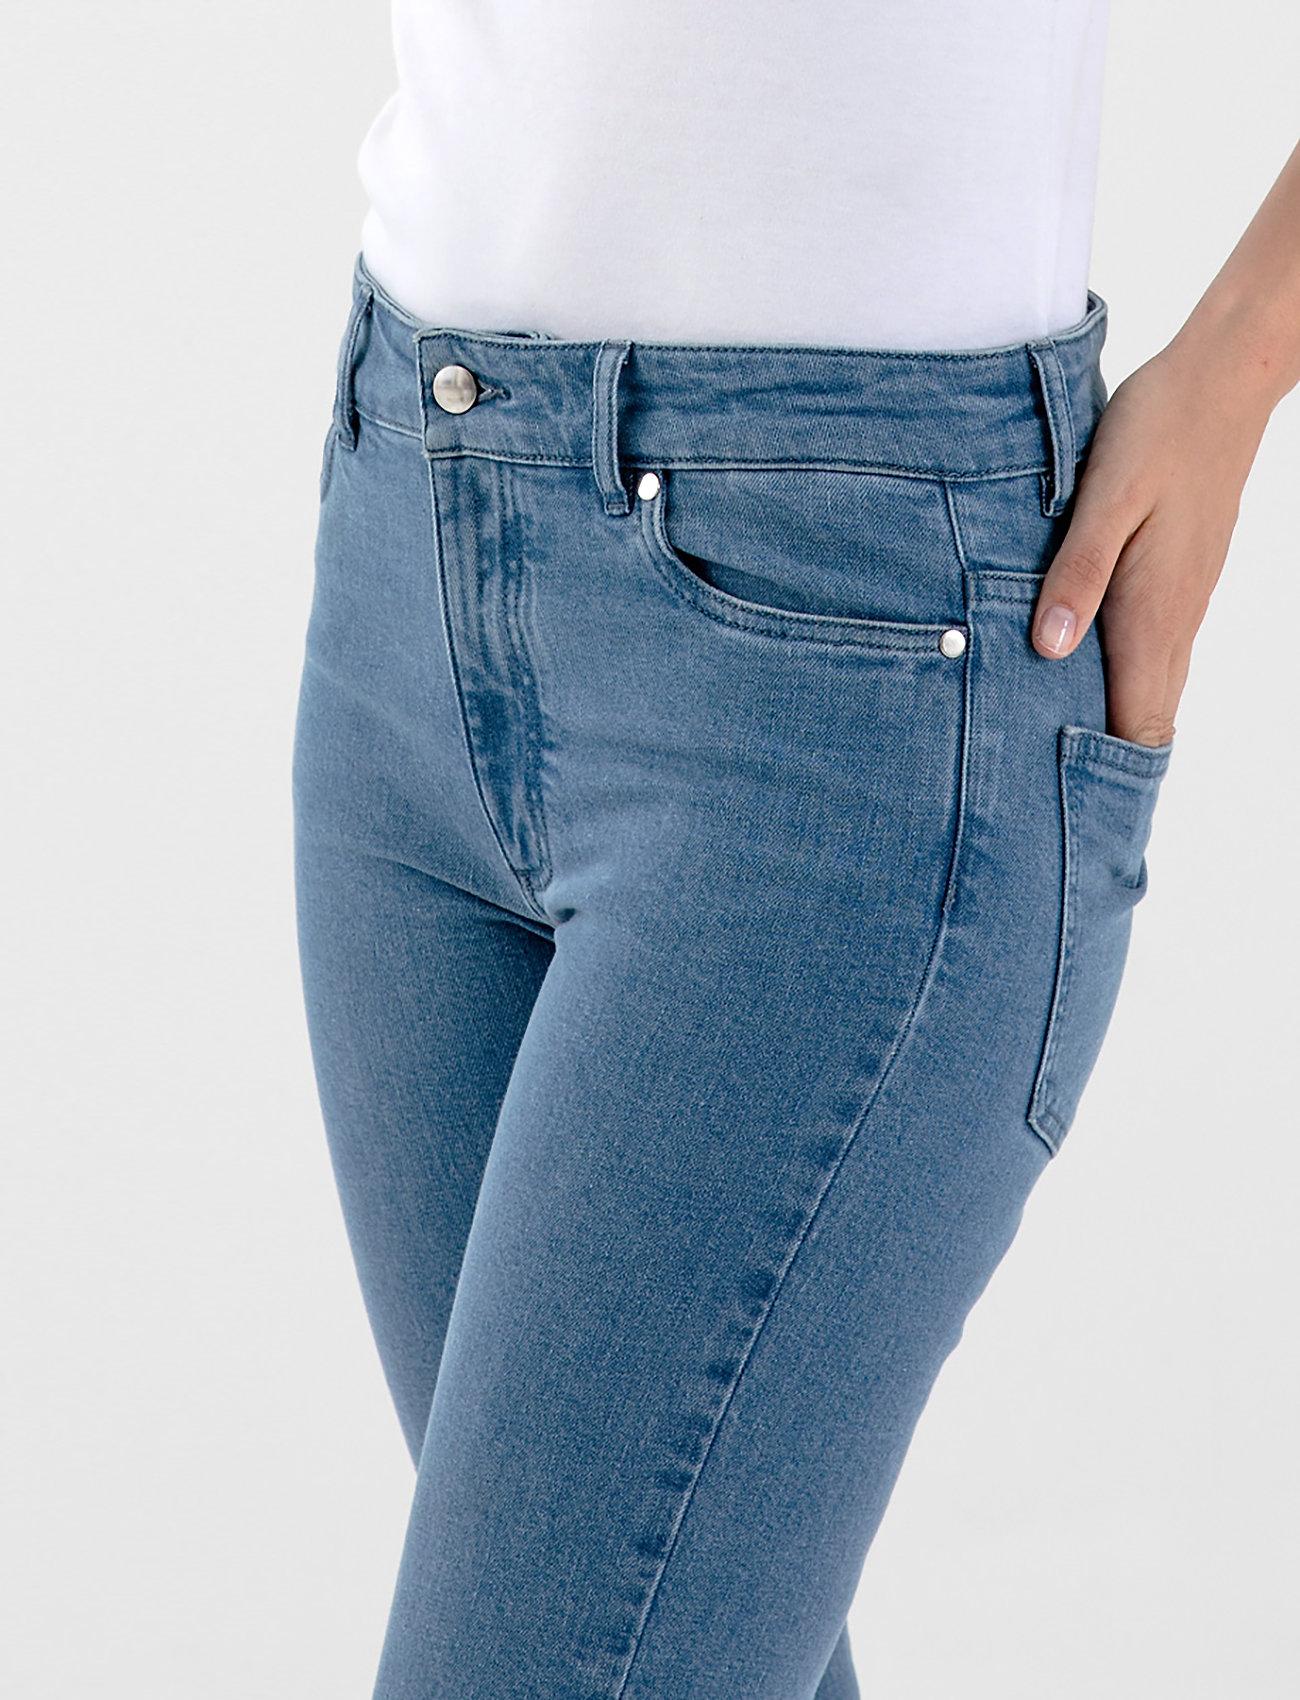 Andiata - Doryla Jeans - schlaghosen - blue - 0